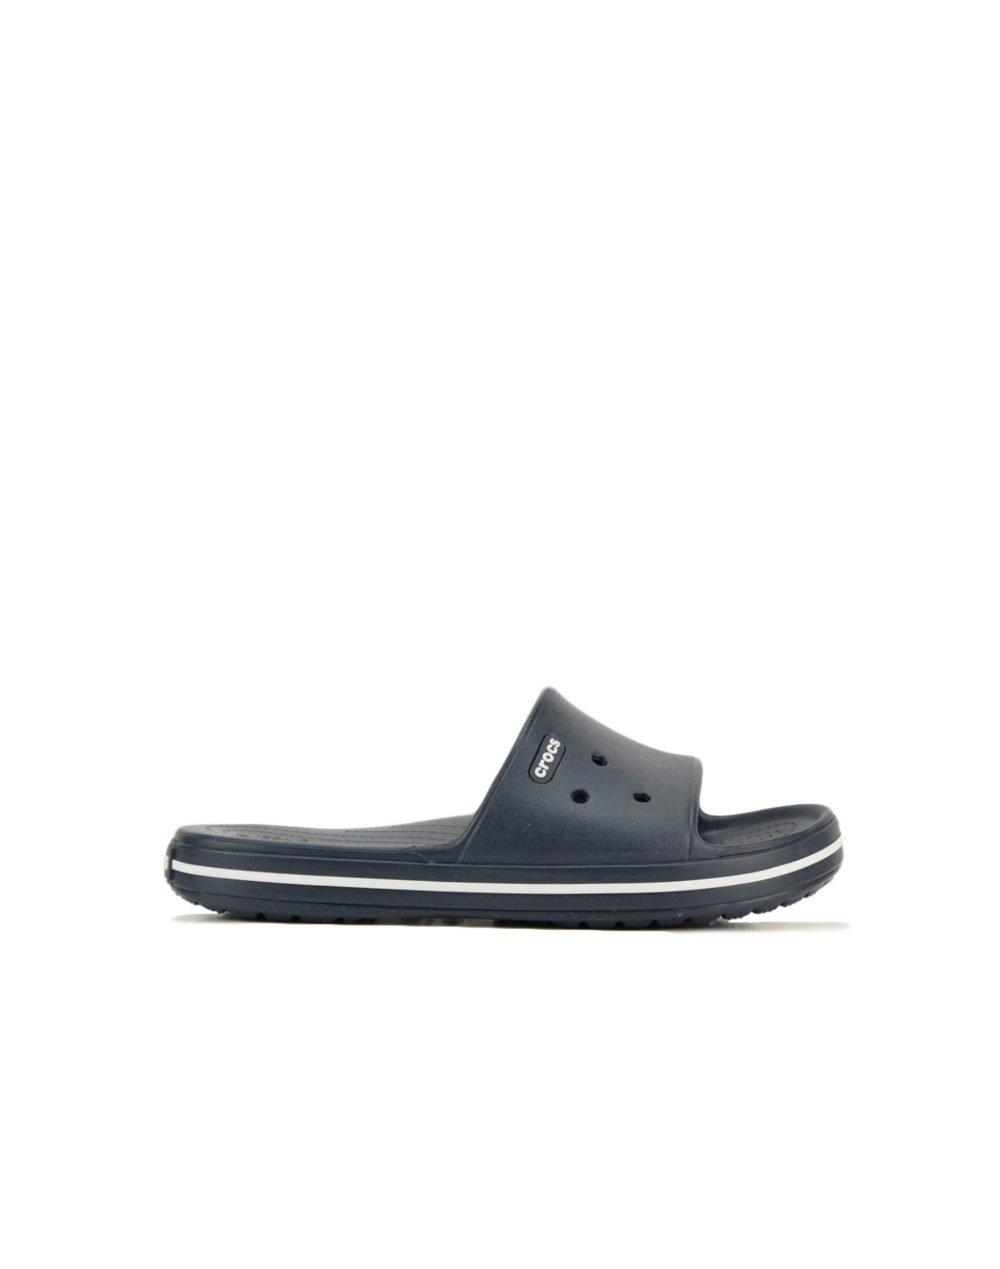 Crocs Crocband III Slide (205733-462) Navy/White